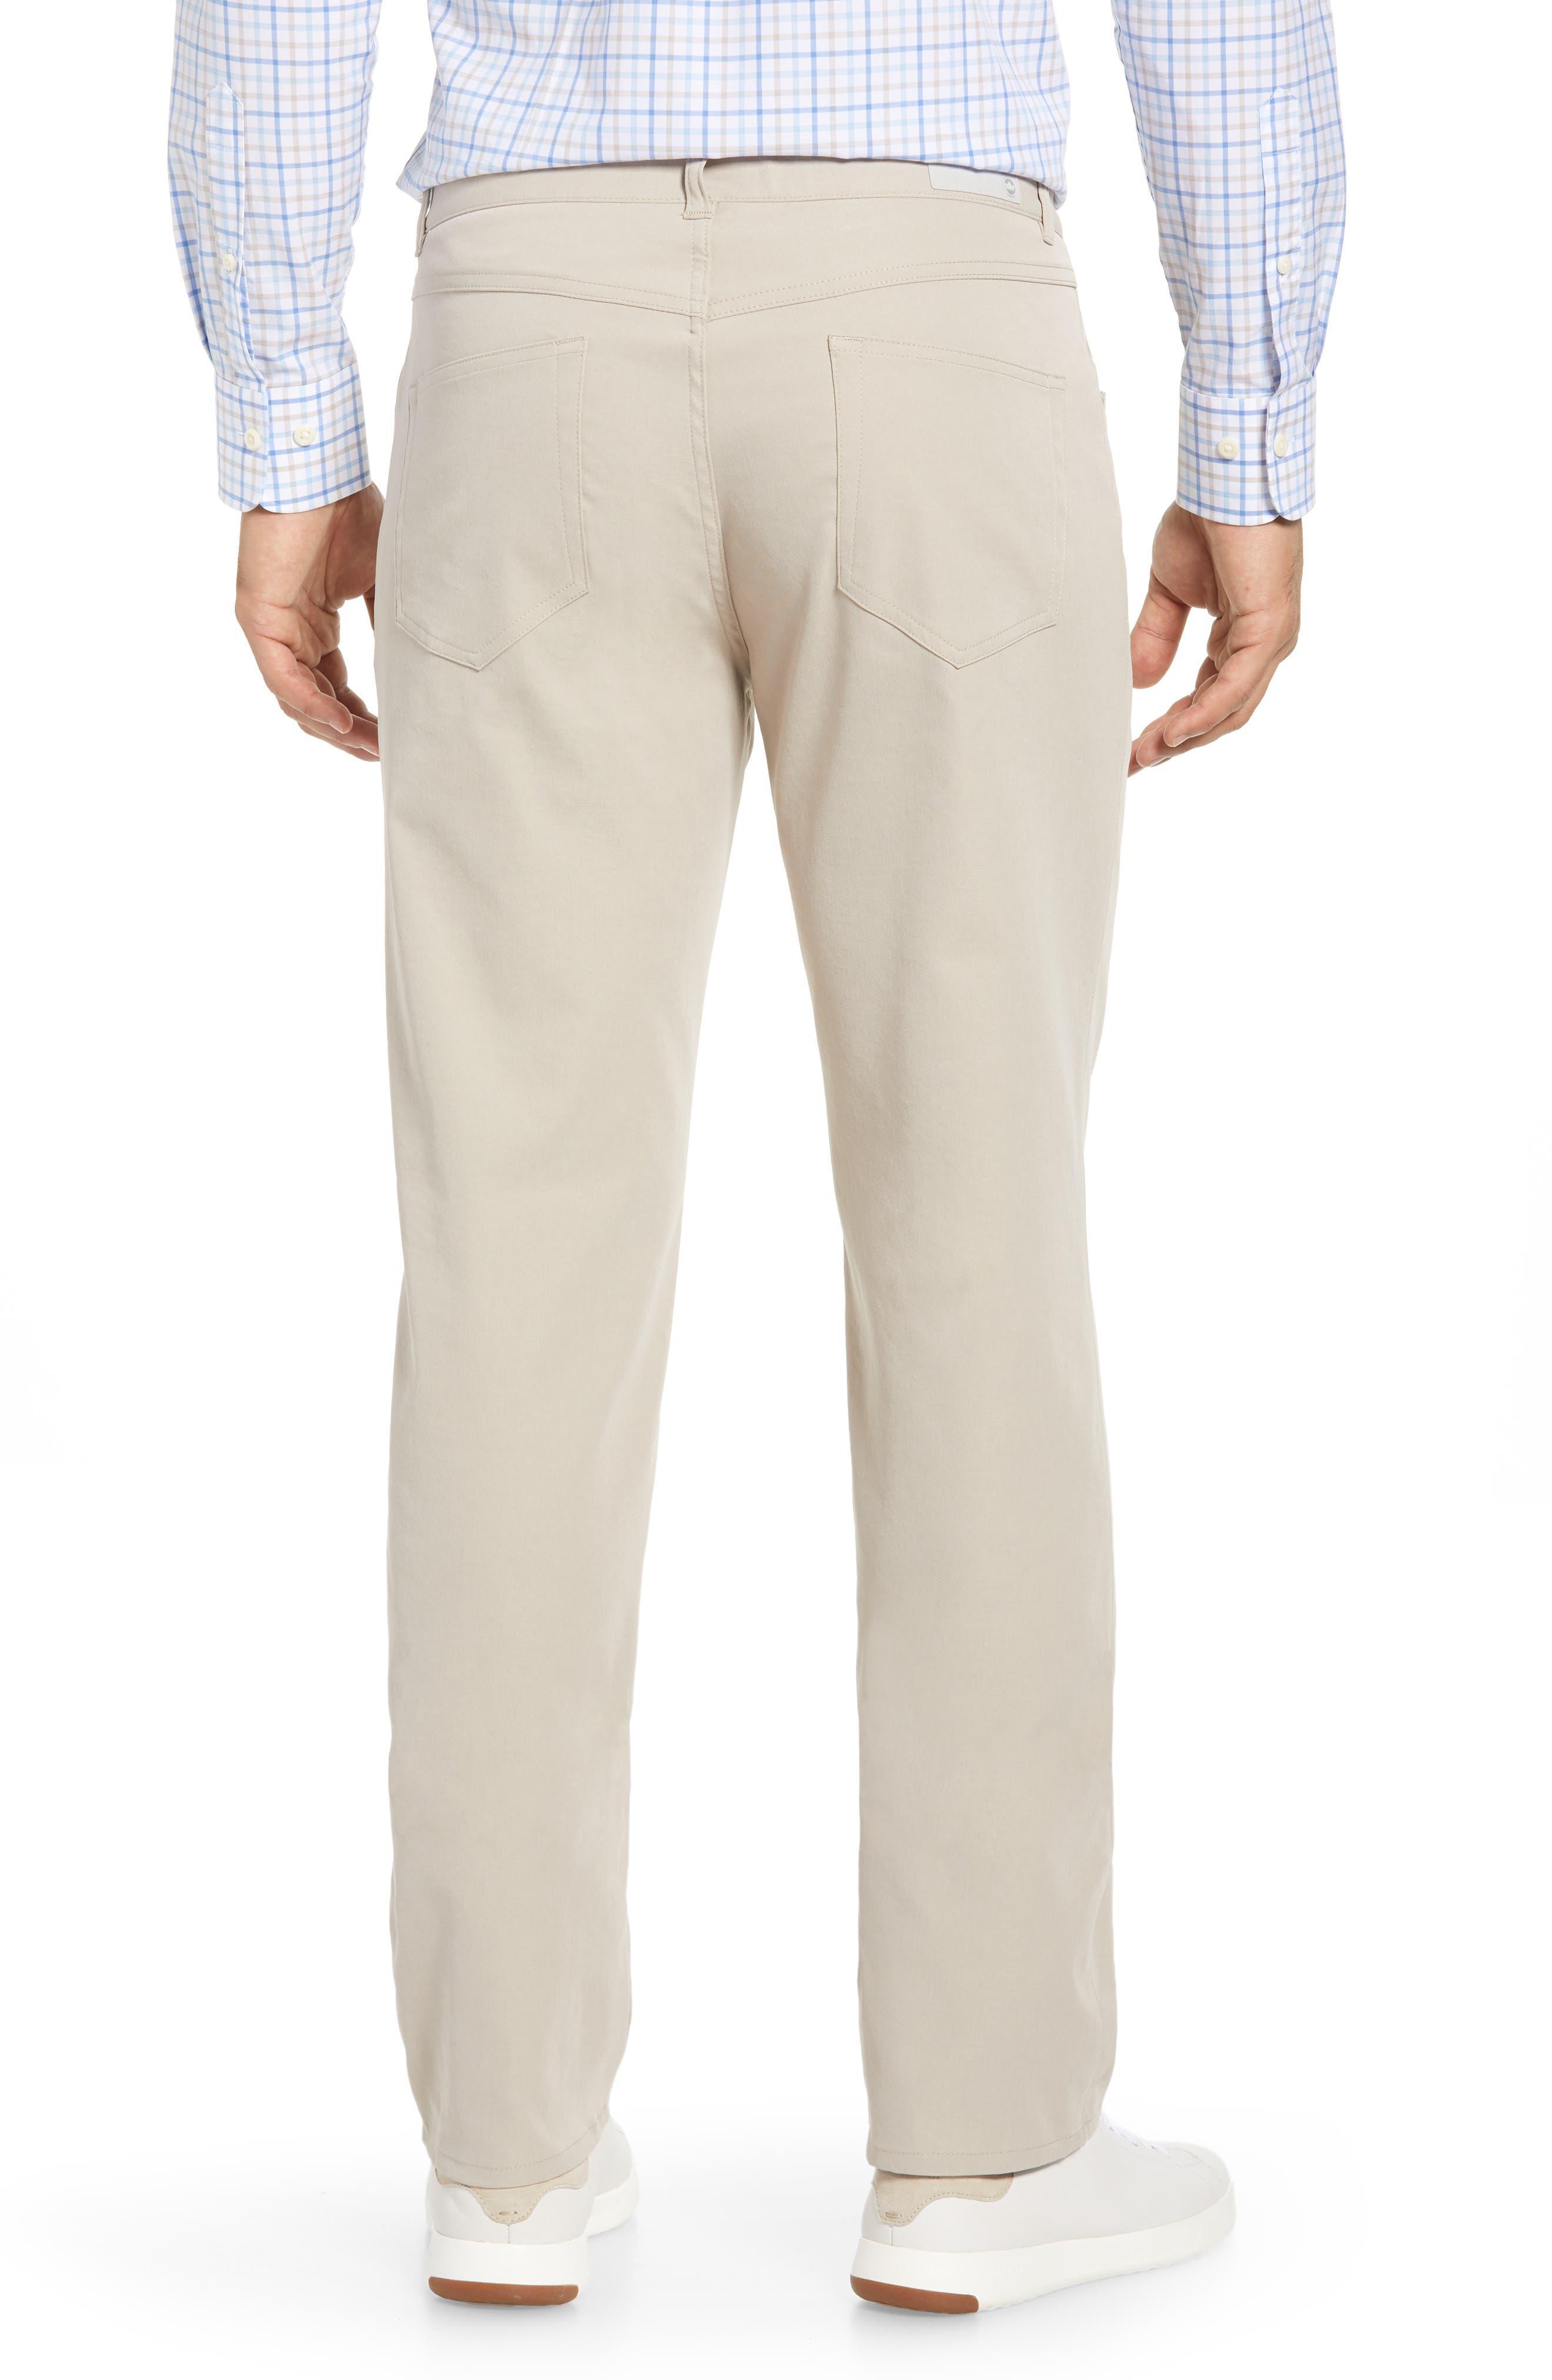 eb66 Regular Fit Performance Pants,                             Alternate thumbnail 2, color,                             BEIGE